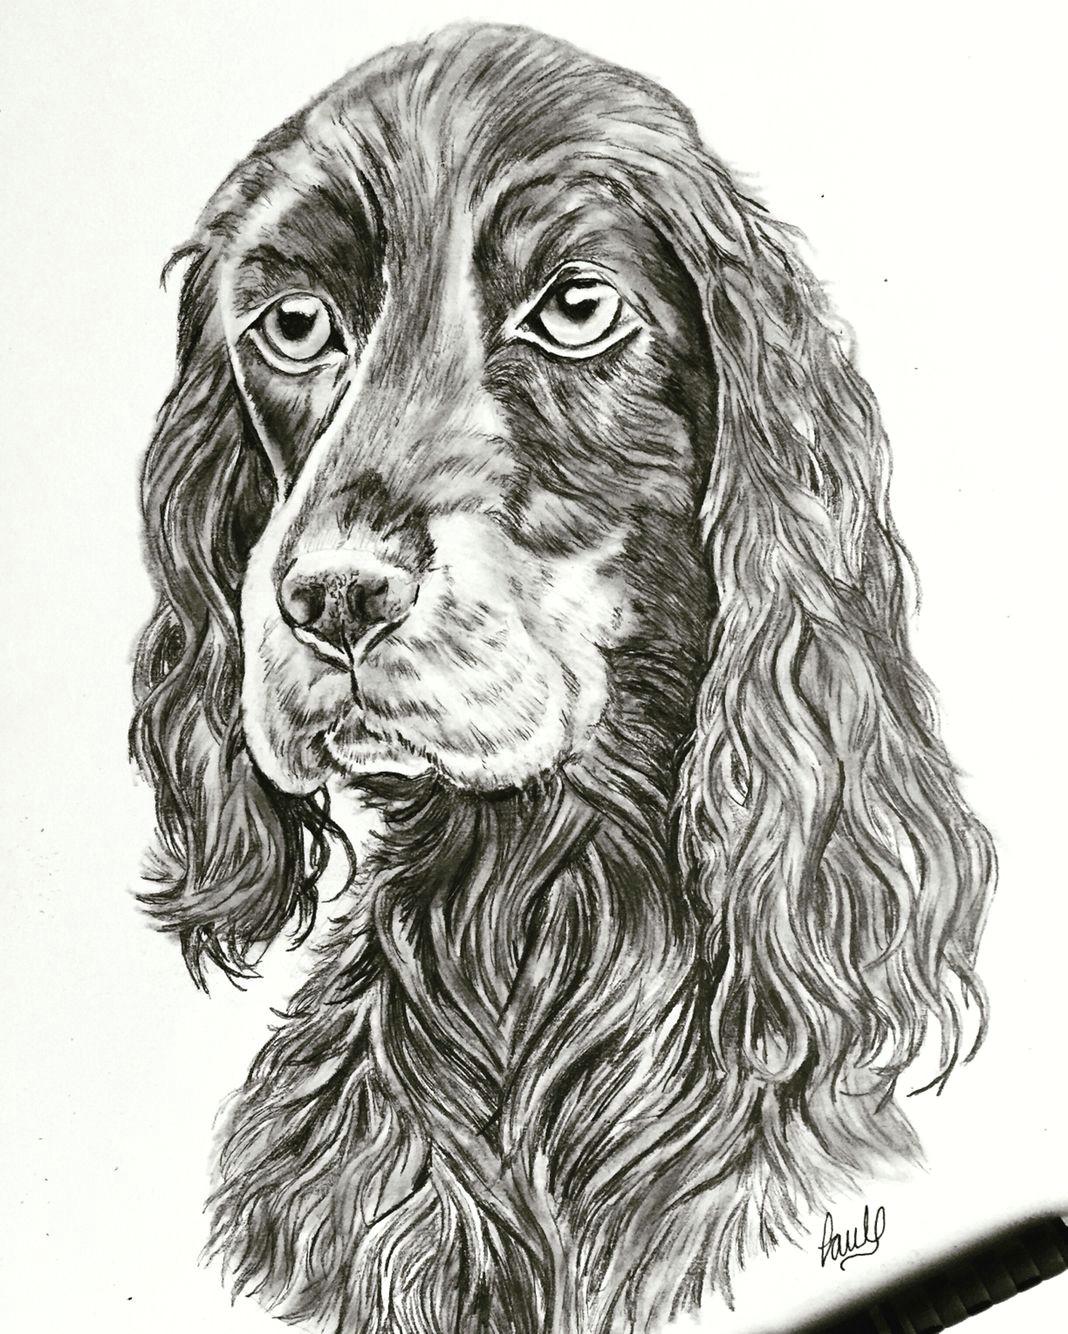 dog sketch done in pencil